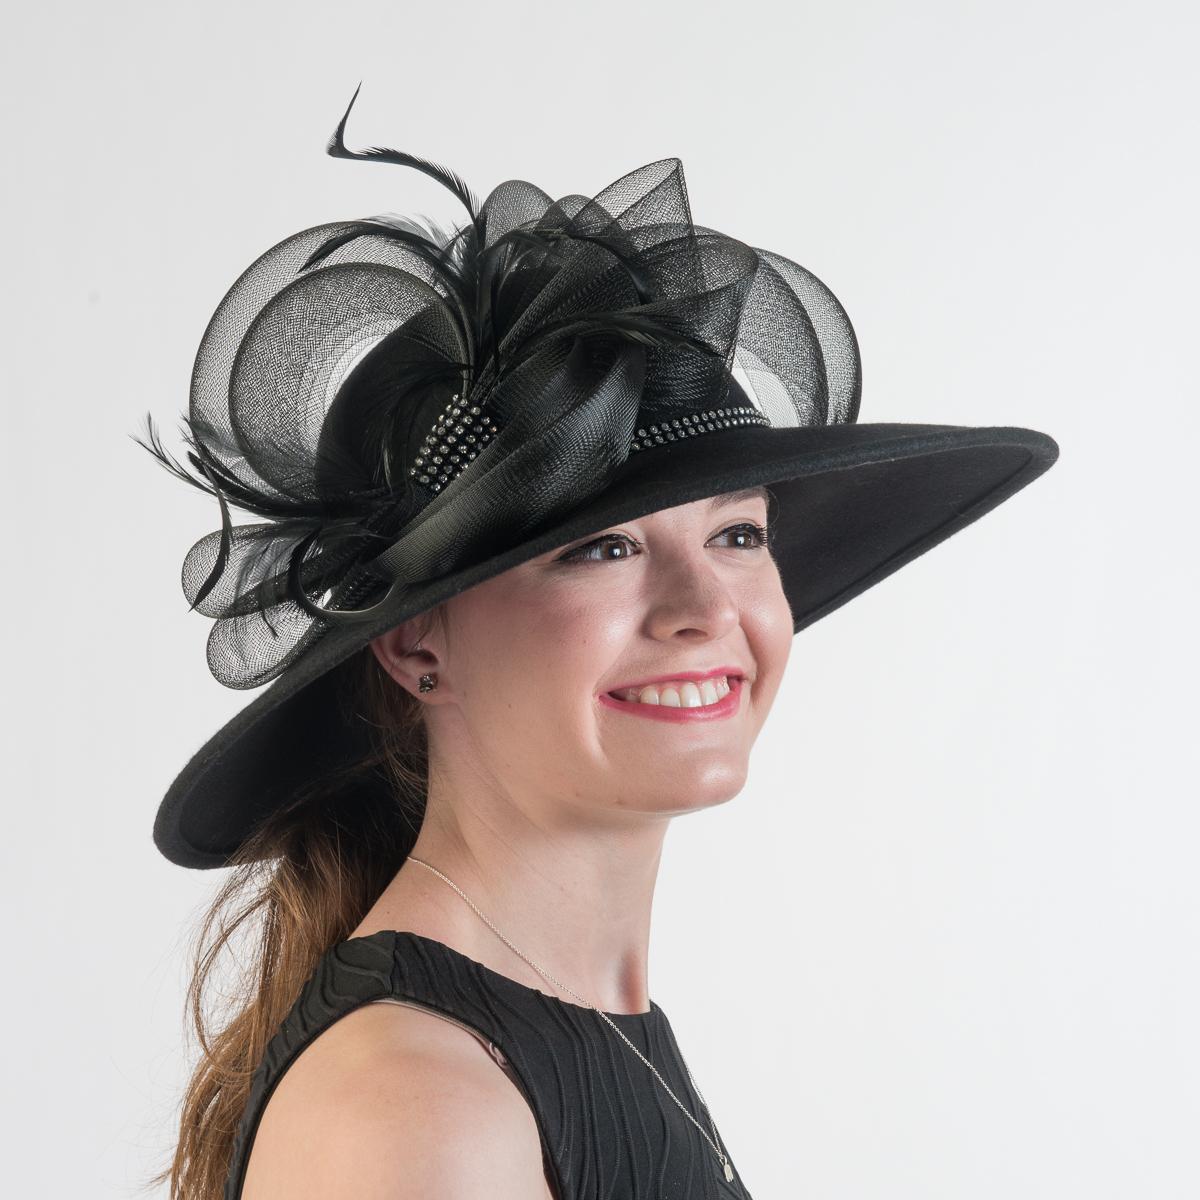 497a1aee079 Black Felight Swinger Crinoline Trim Hats-400687-BK- Sun Yorkos ...